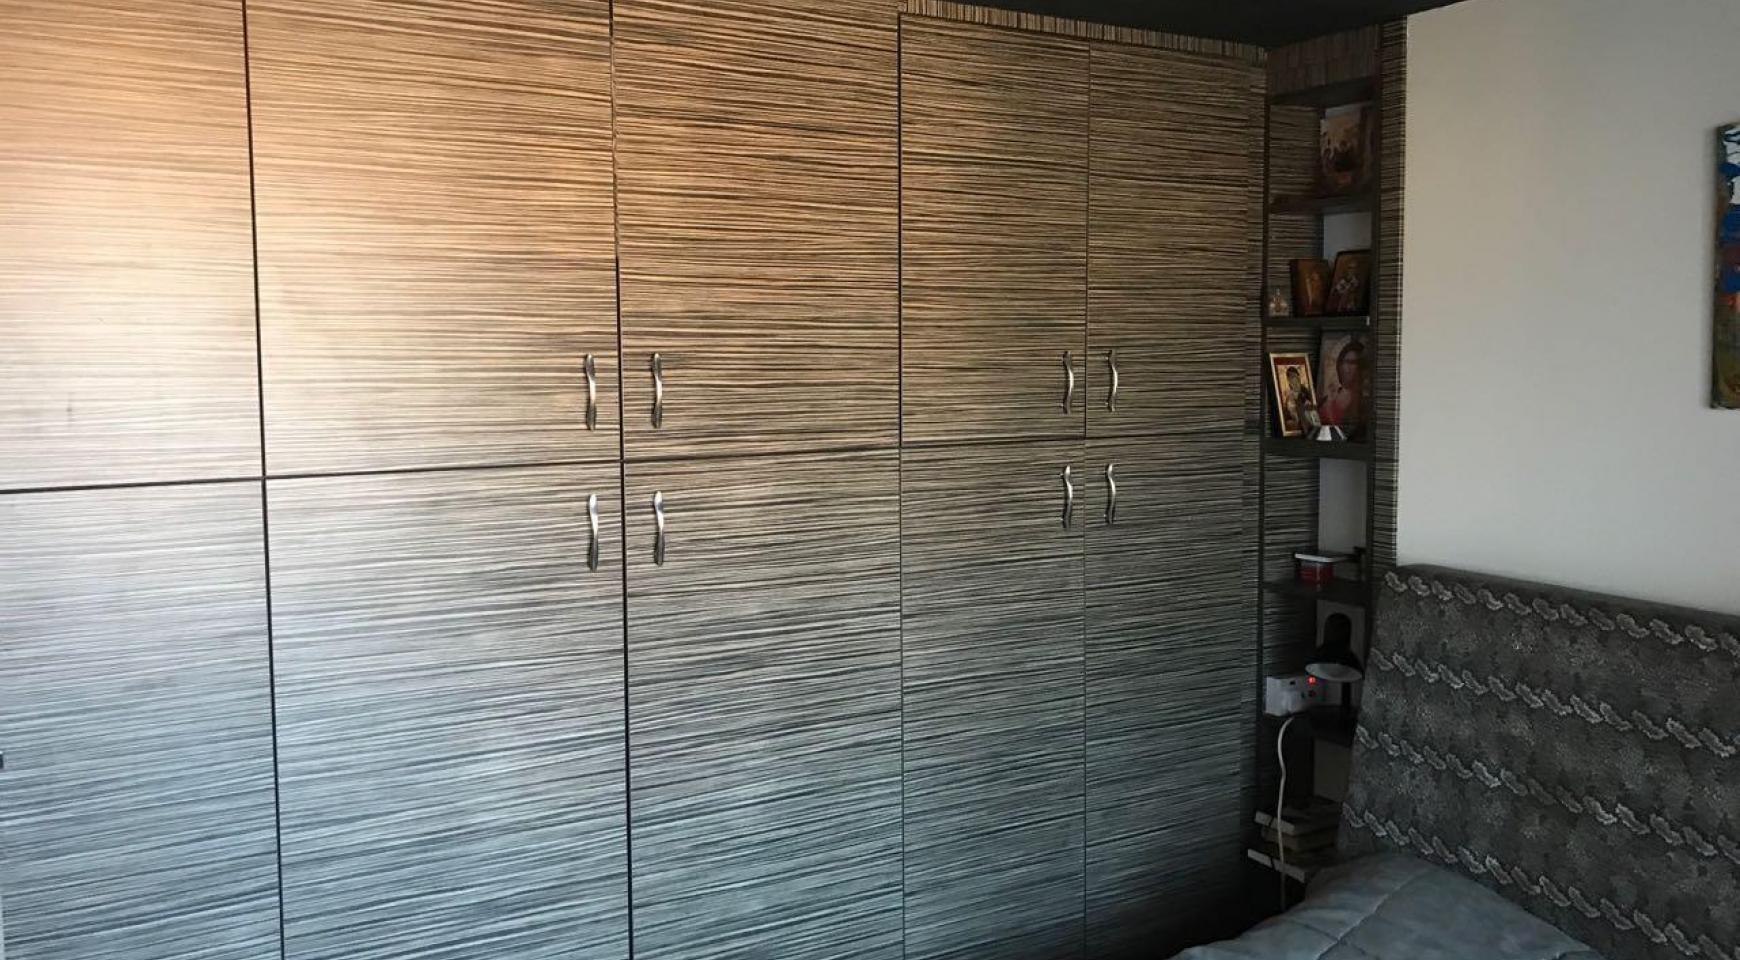 3 Bedroom Apartment in Molos Area near Limassol Marina - 14